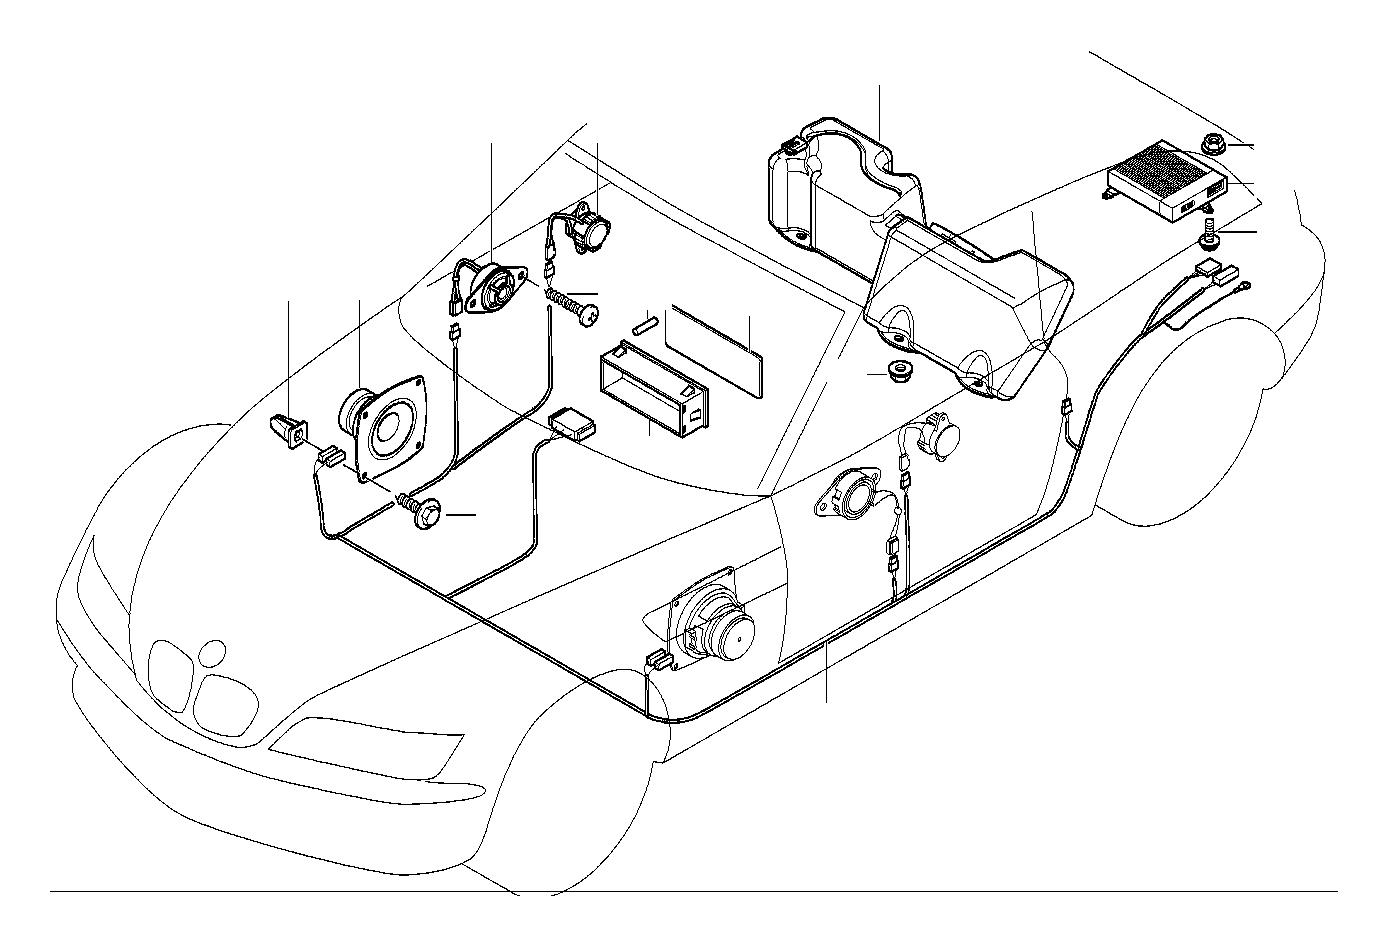 Bmw Z3 Mid Range Loudspeaker Harman Kardon System